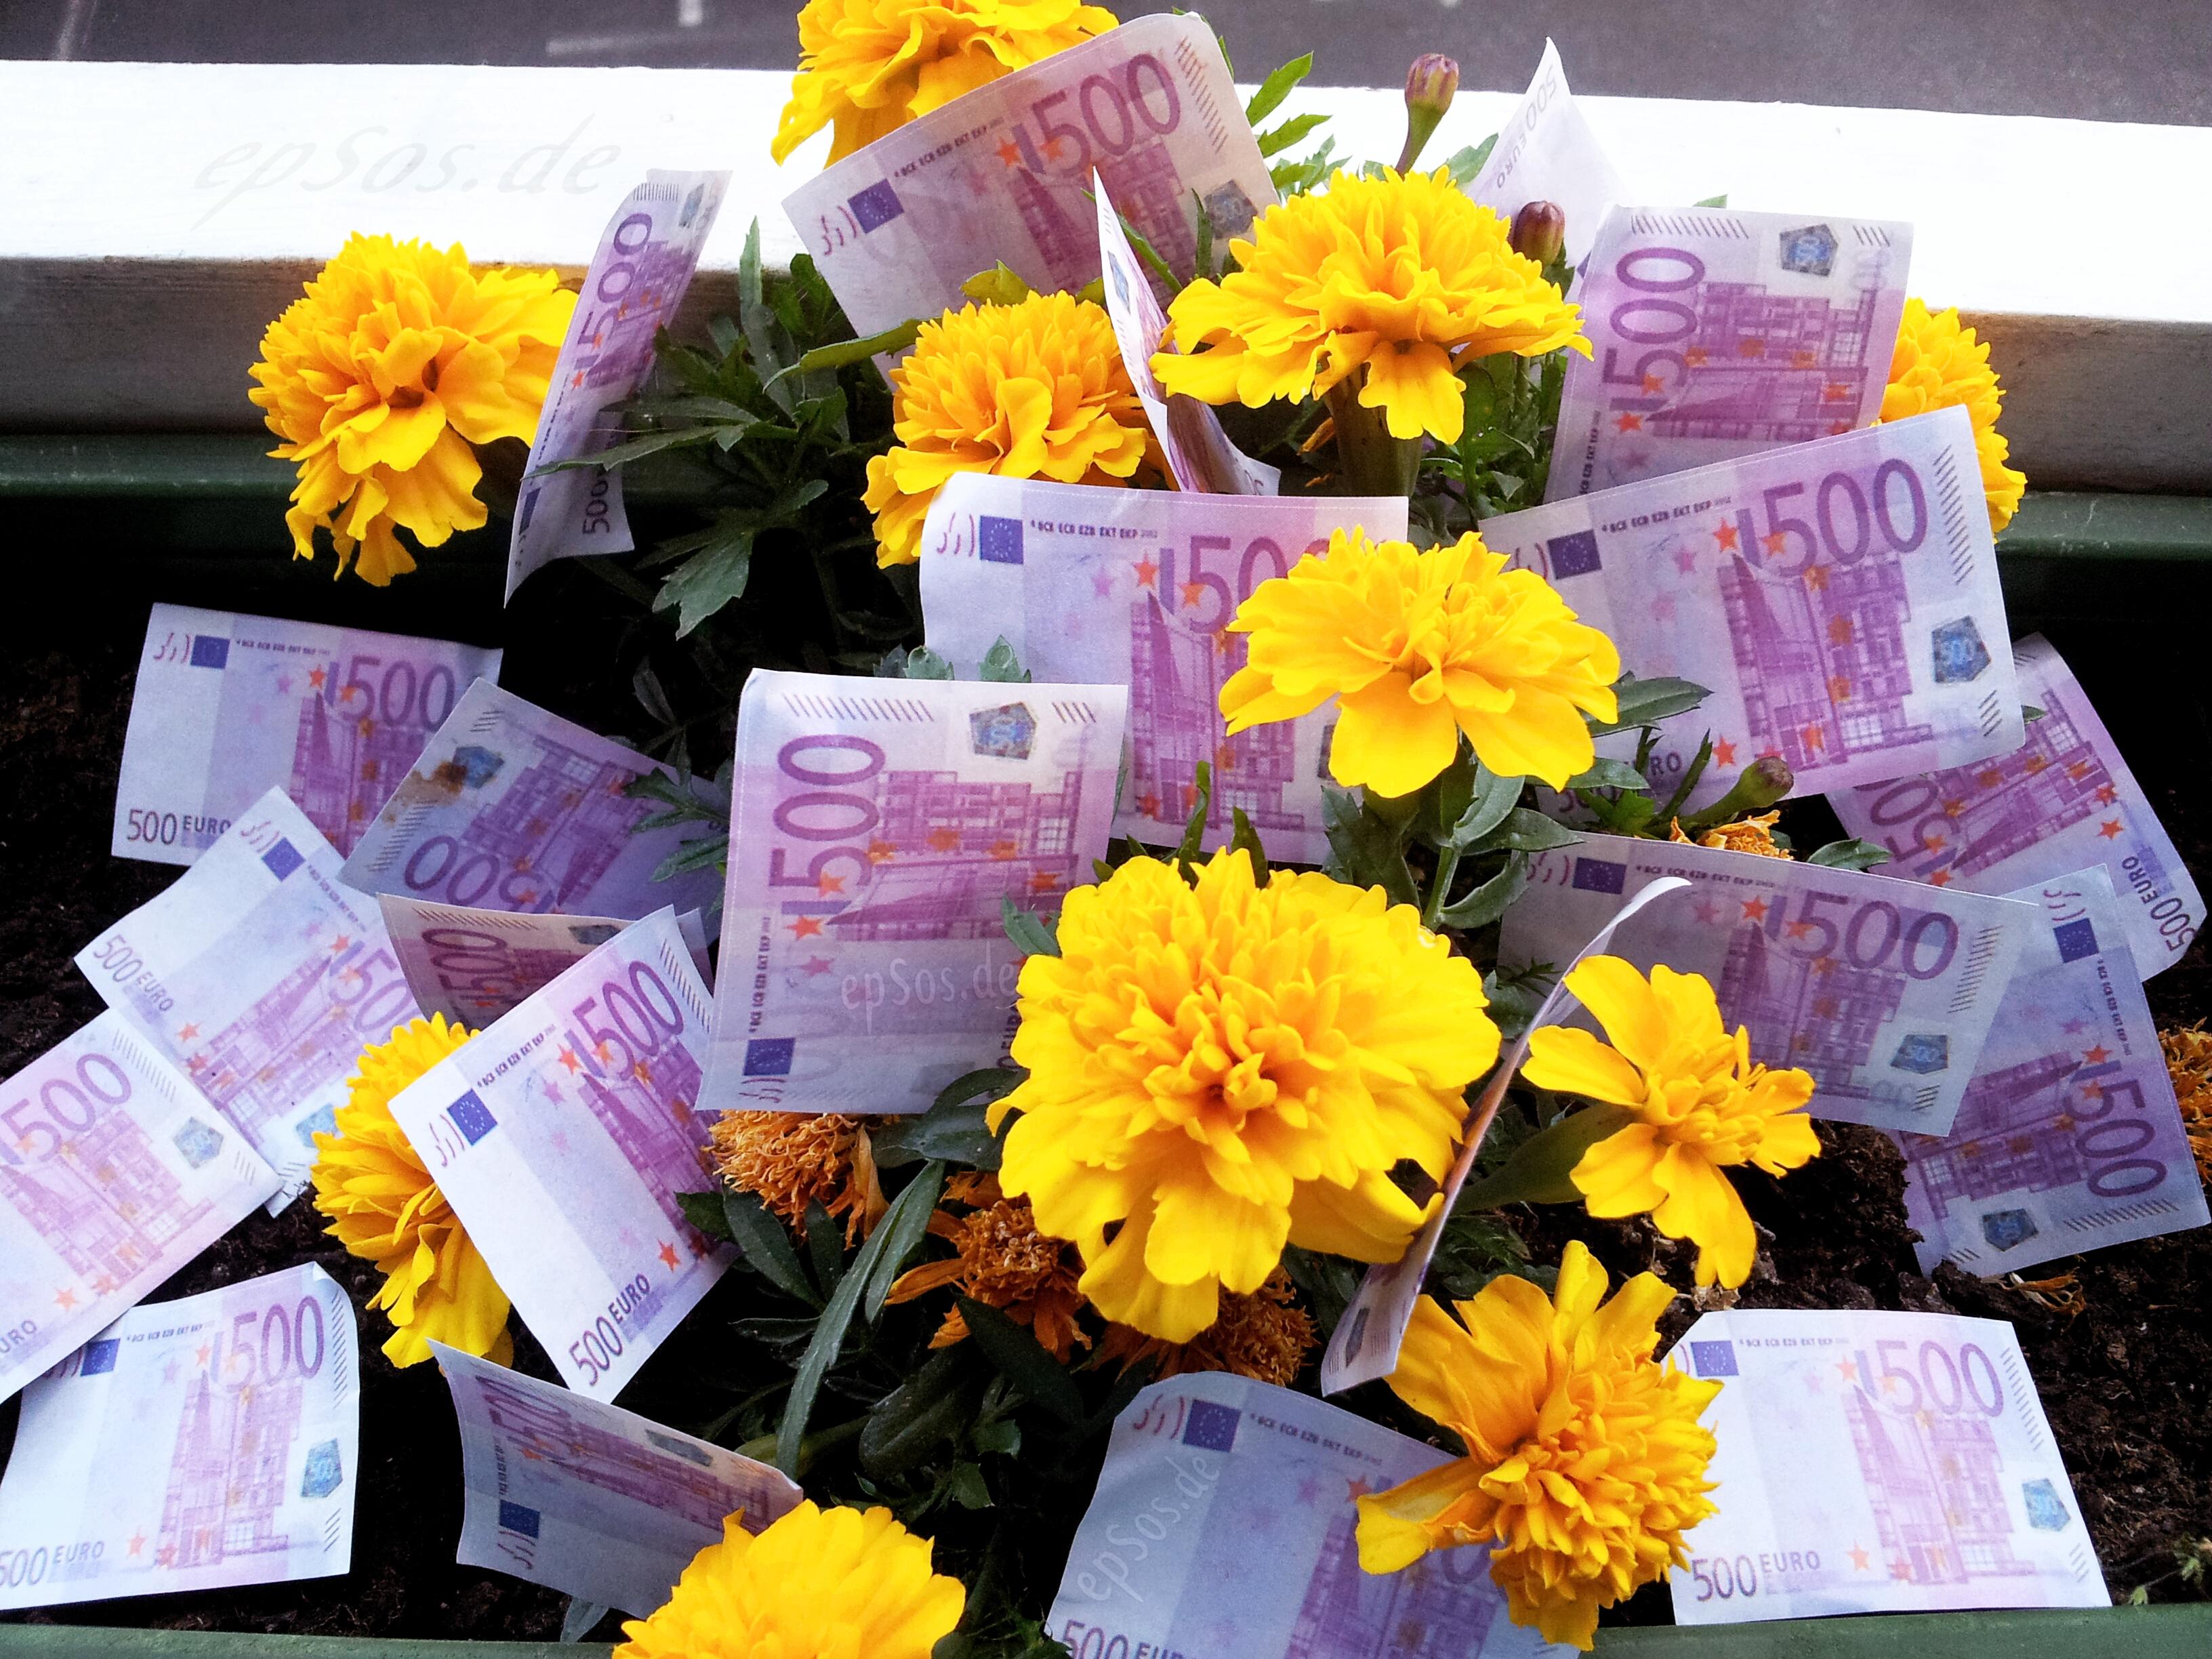 Filegrowing free money on flowersg wikimedia commons filegrowing free money on flowersg izmirmasajfo